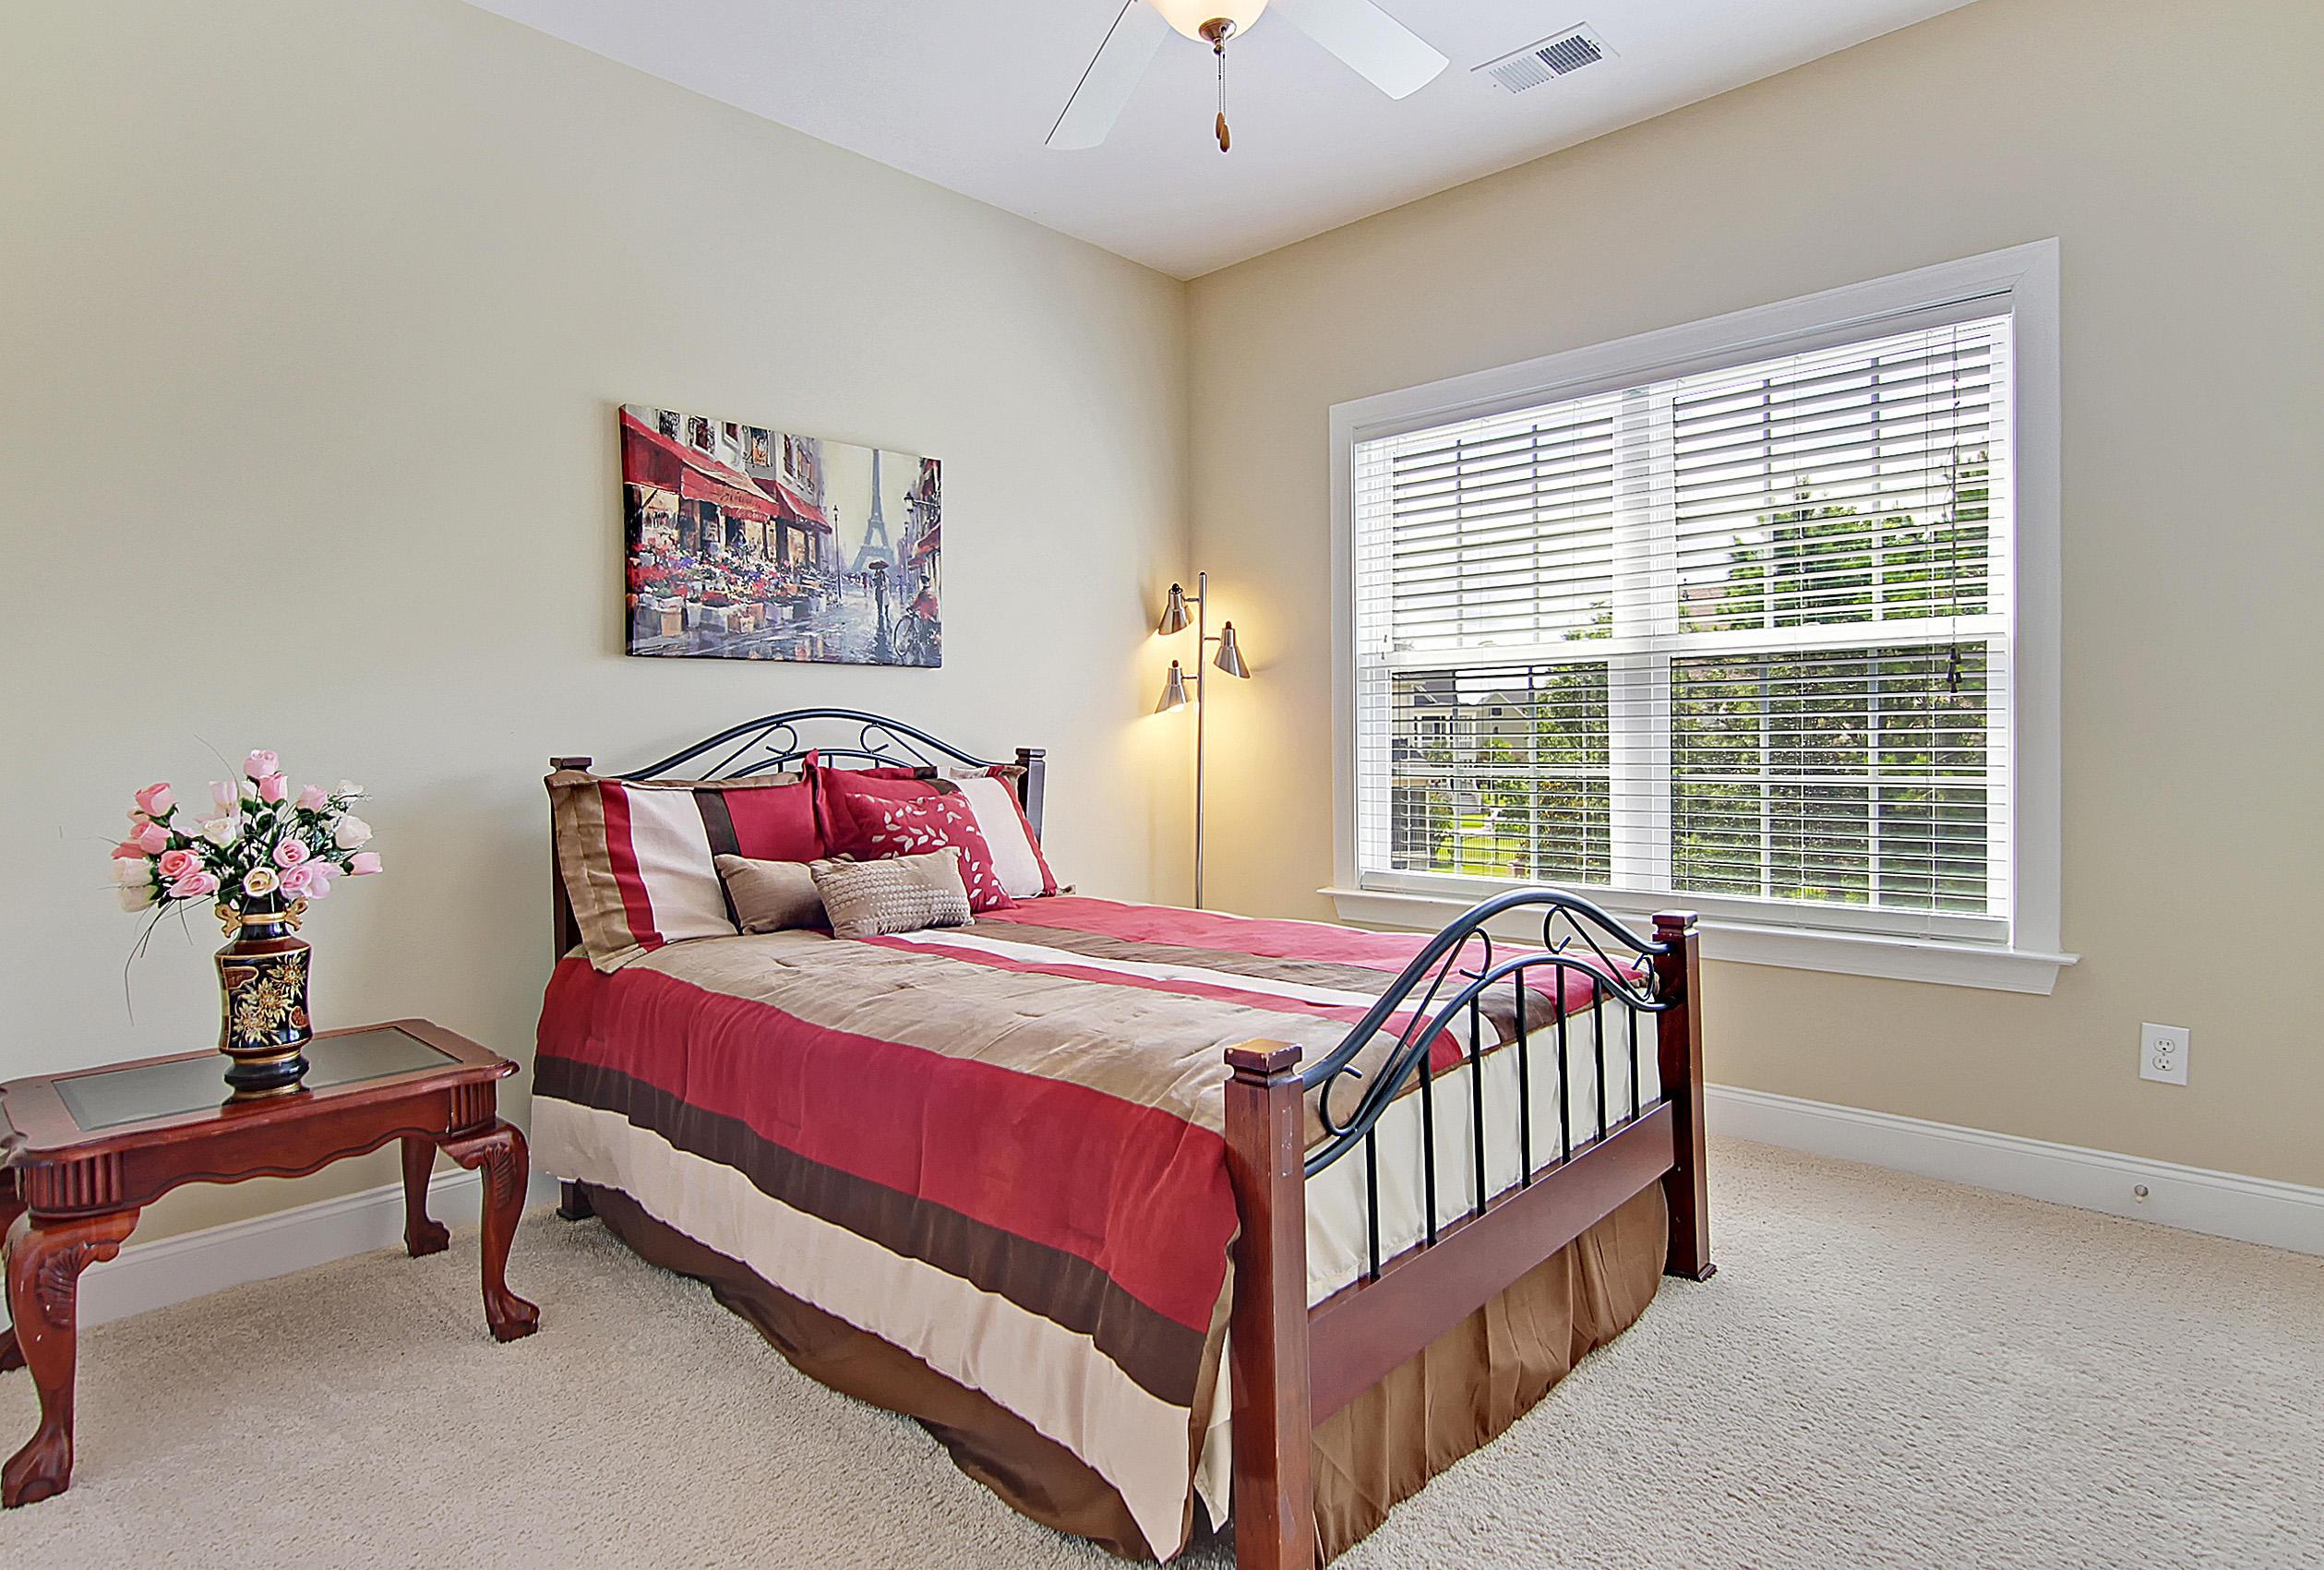 Dunes West Homes For Sale - 1332 Whisker Pole, Mount Pleasant, SC - 43